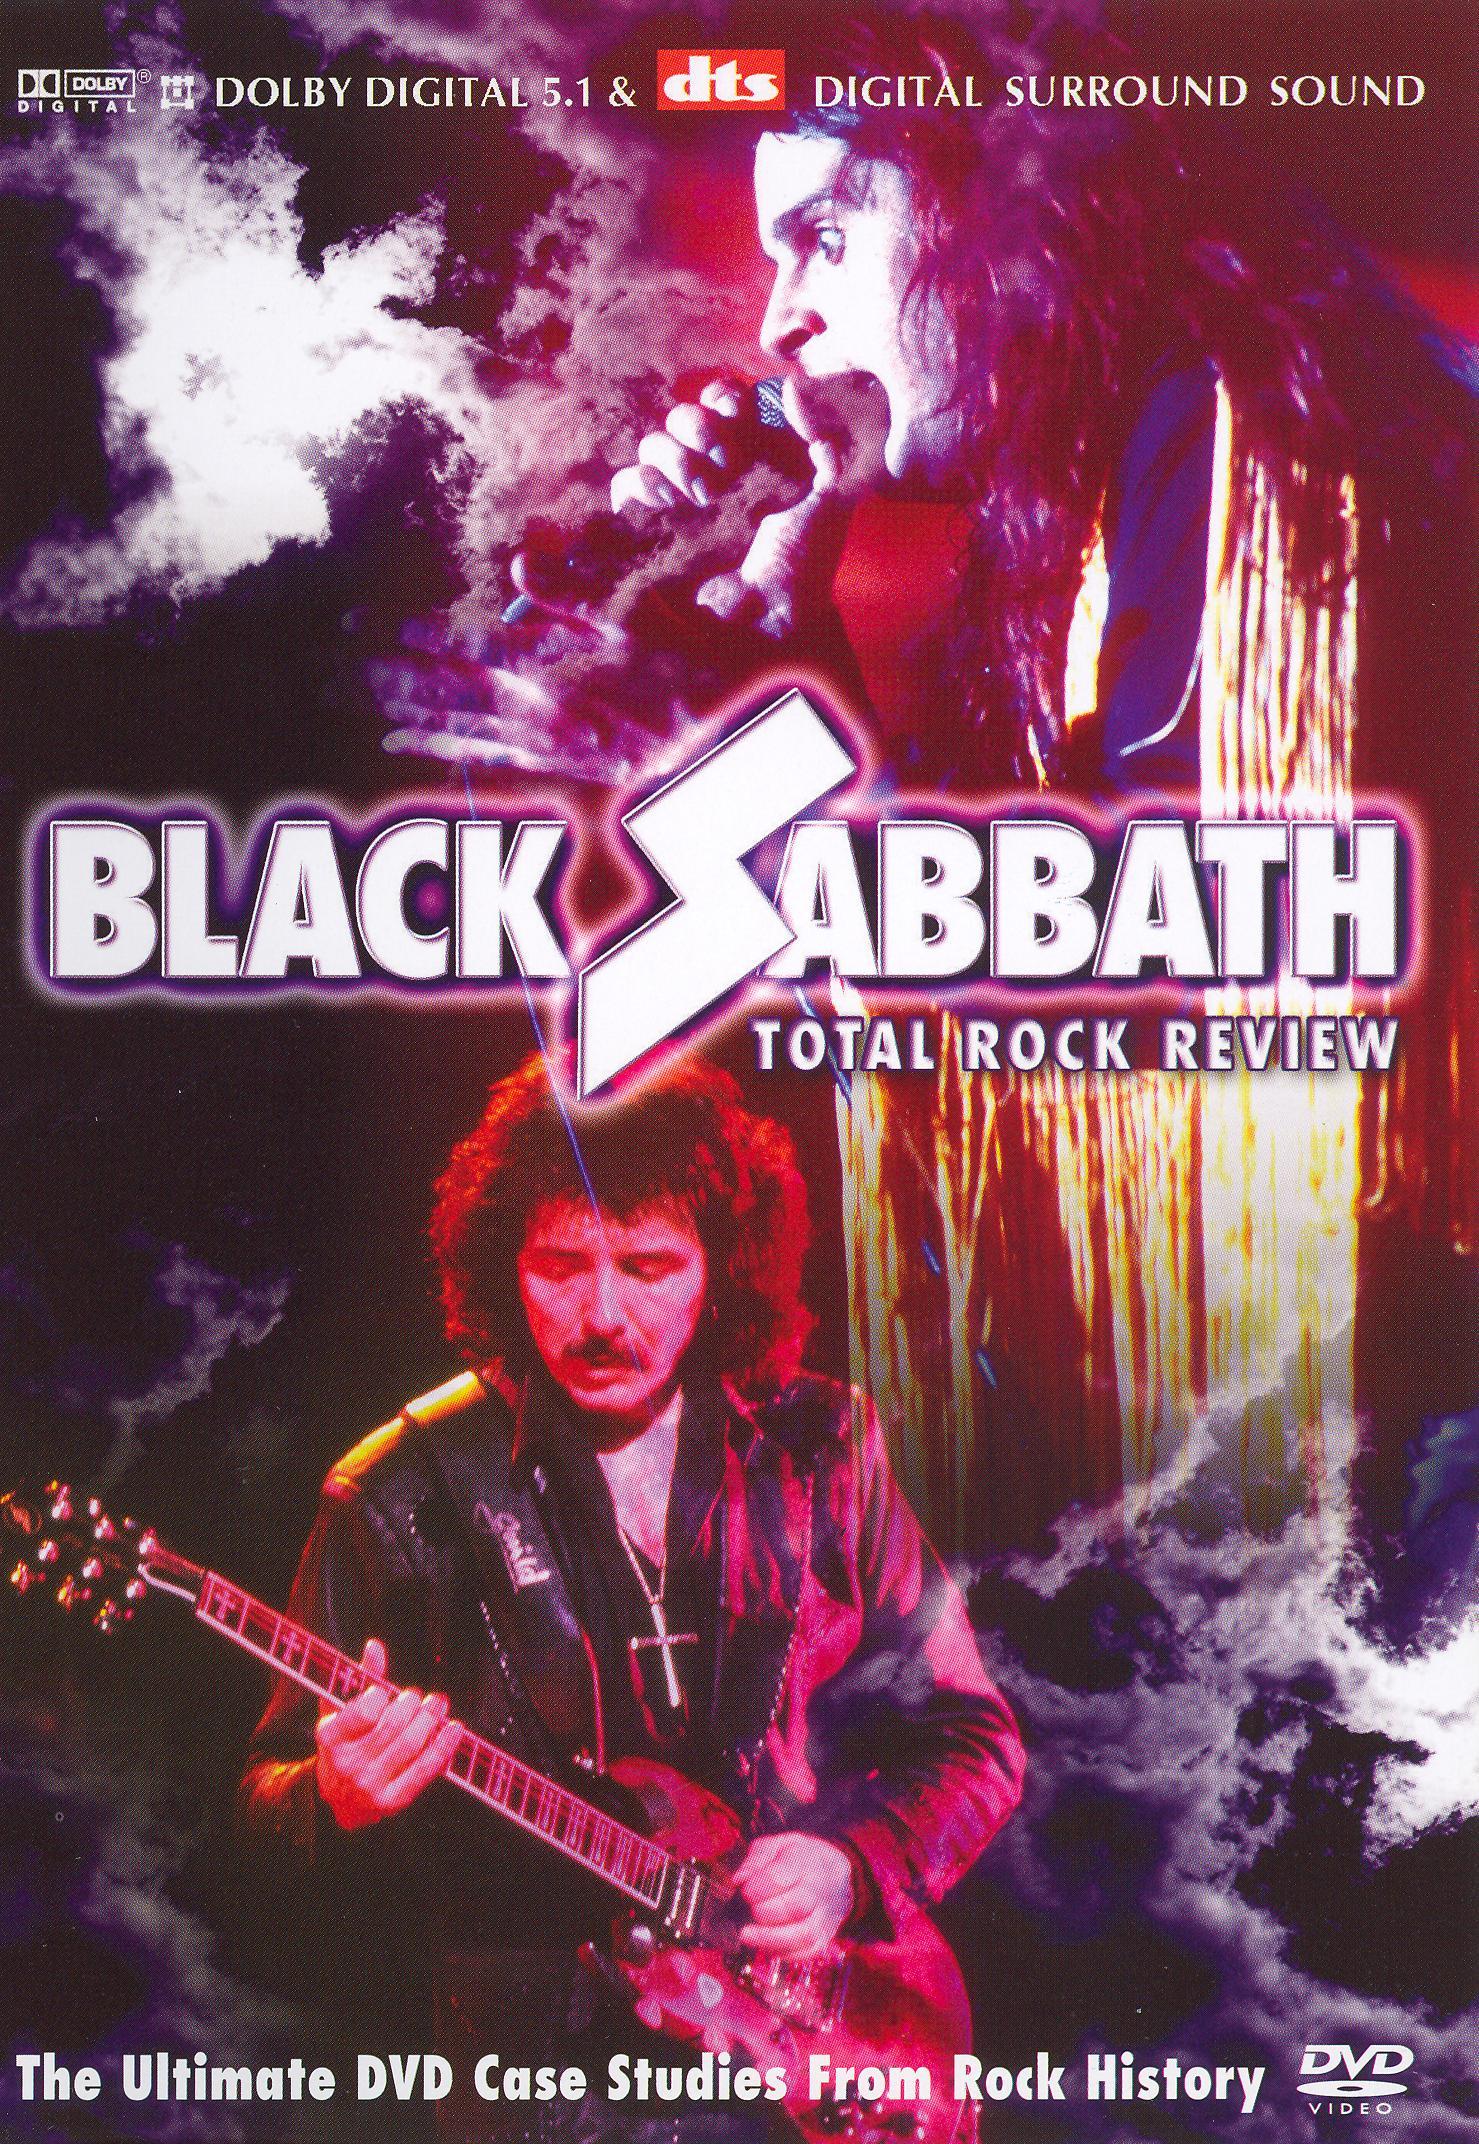 Total Rock Review: Black Sabbath